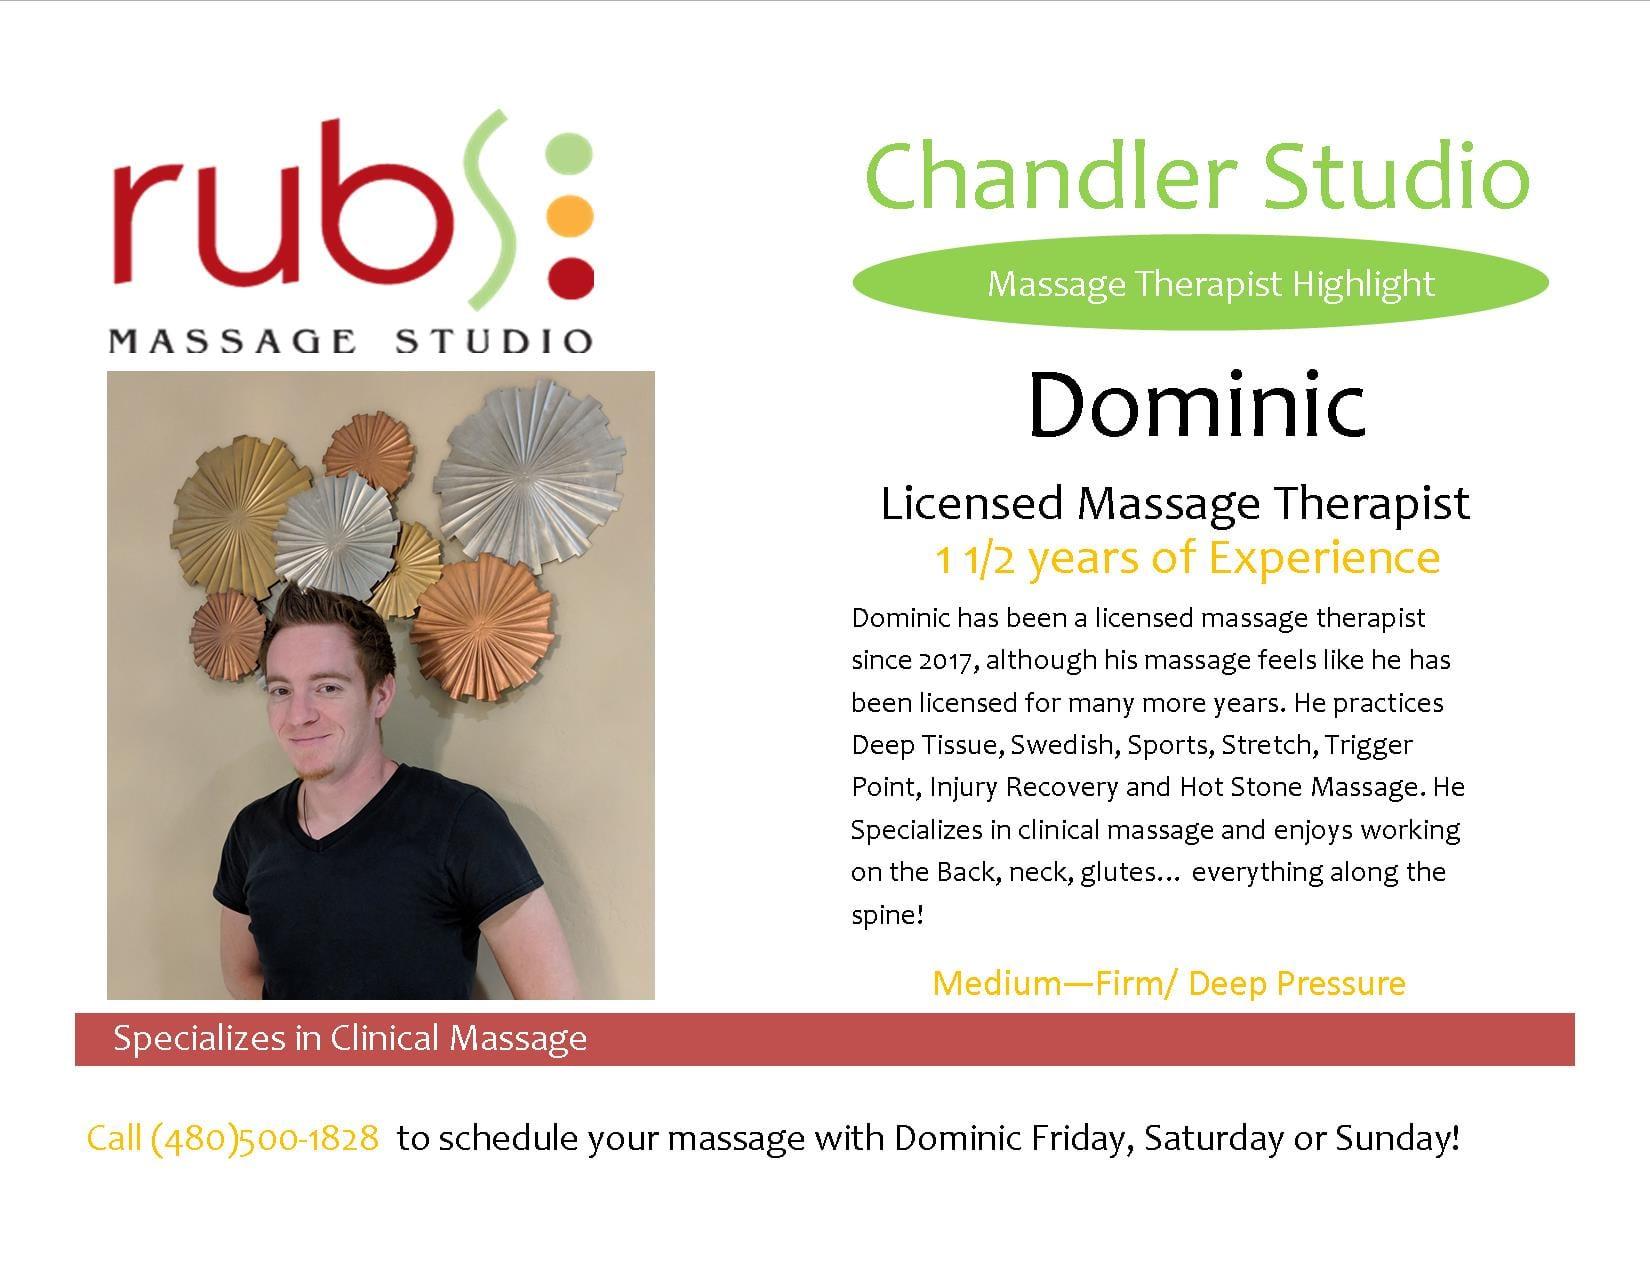 massage chandler therapist - dominic